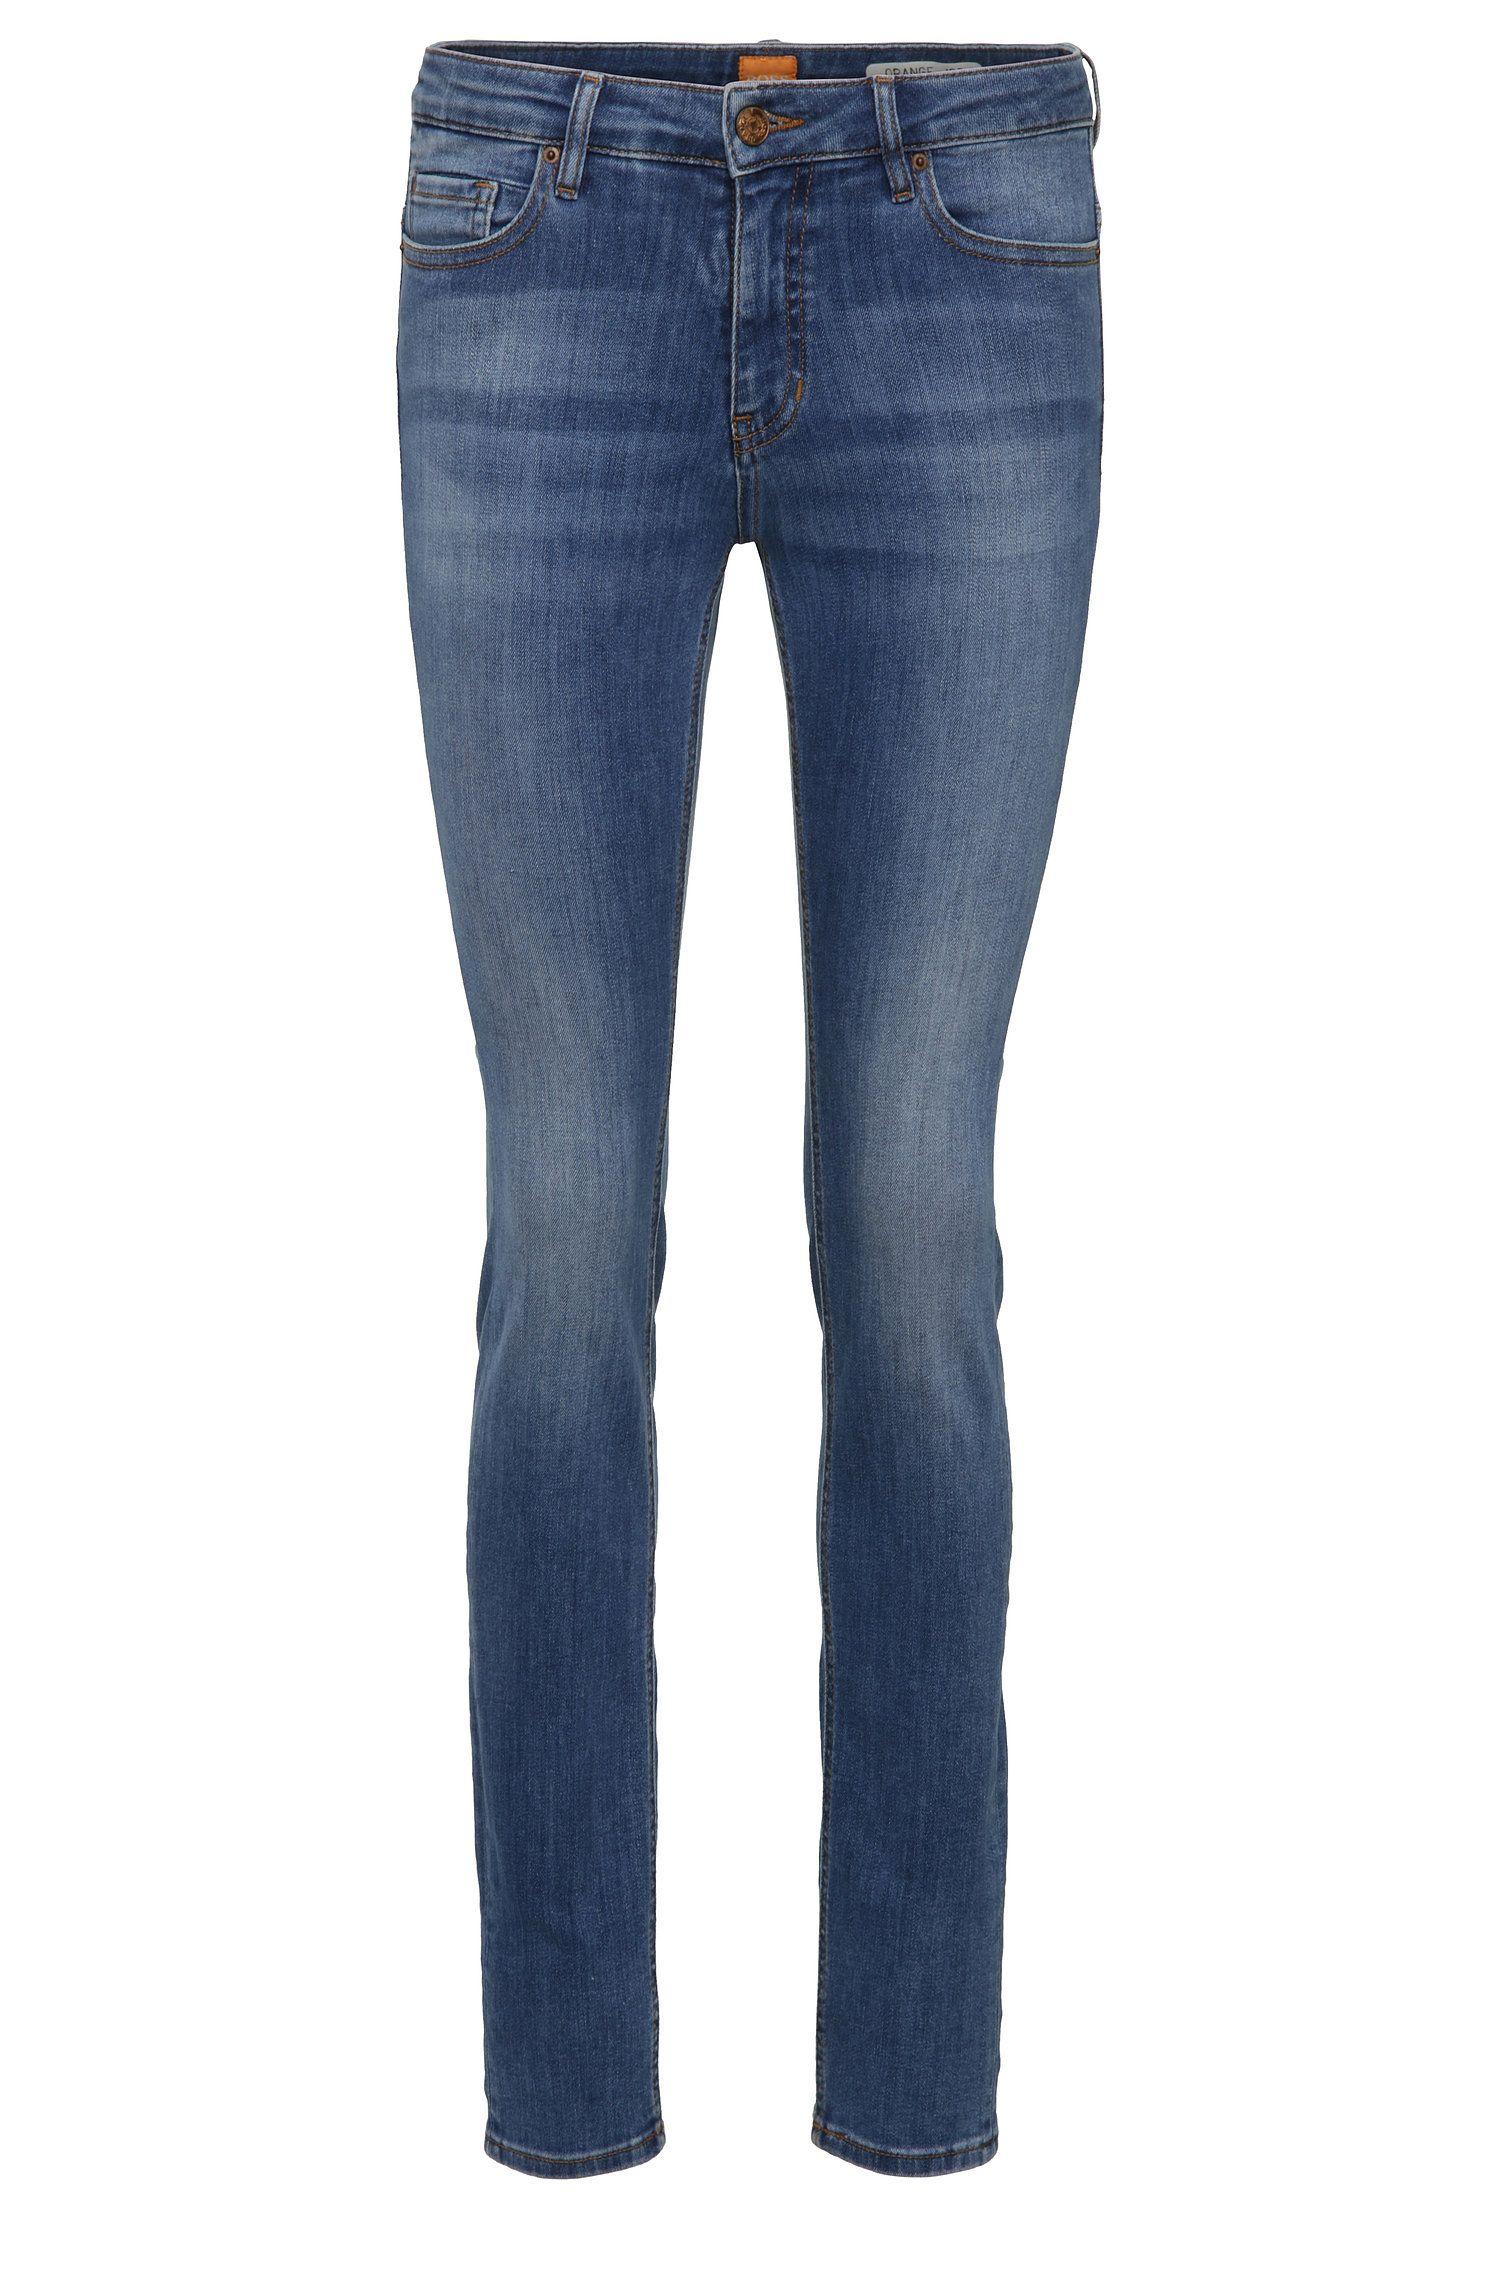 Slim-fit jeans in stretch cotton blend in used look: 'Orange J20 Sidney'